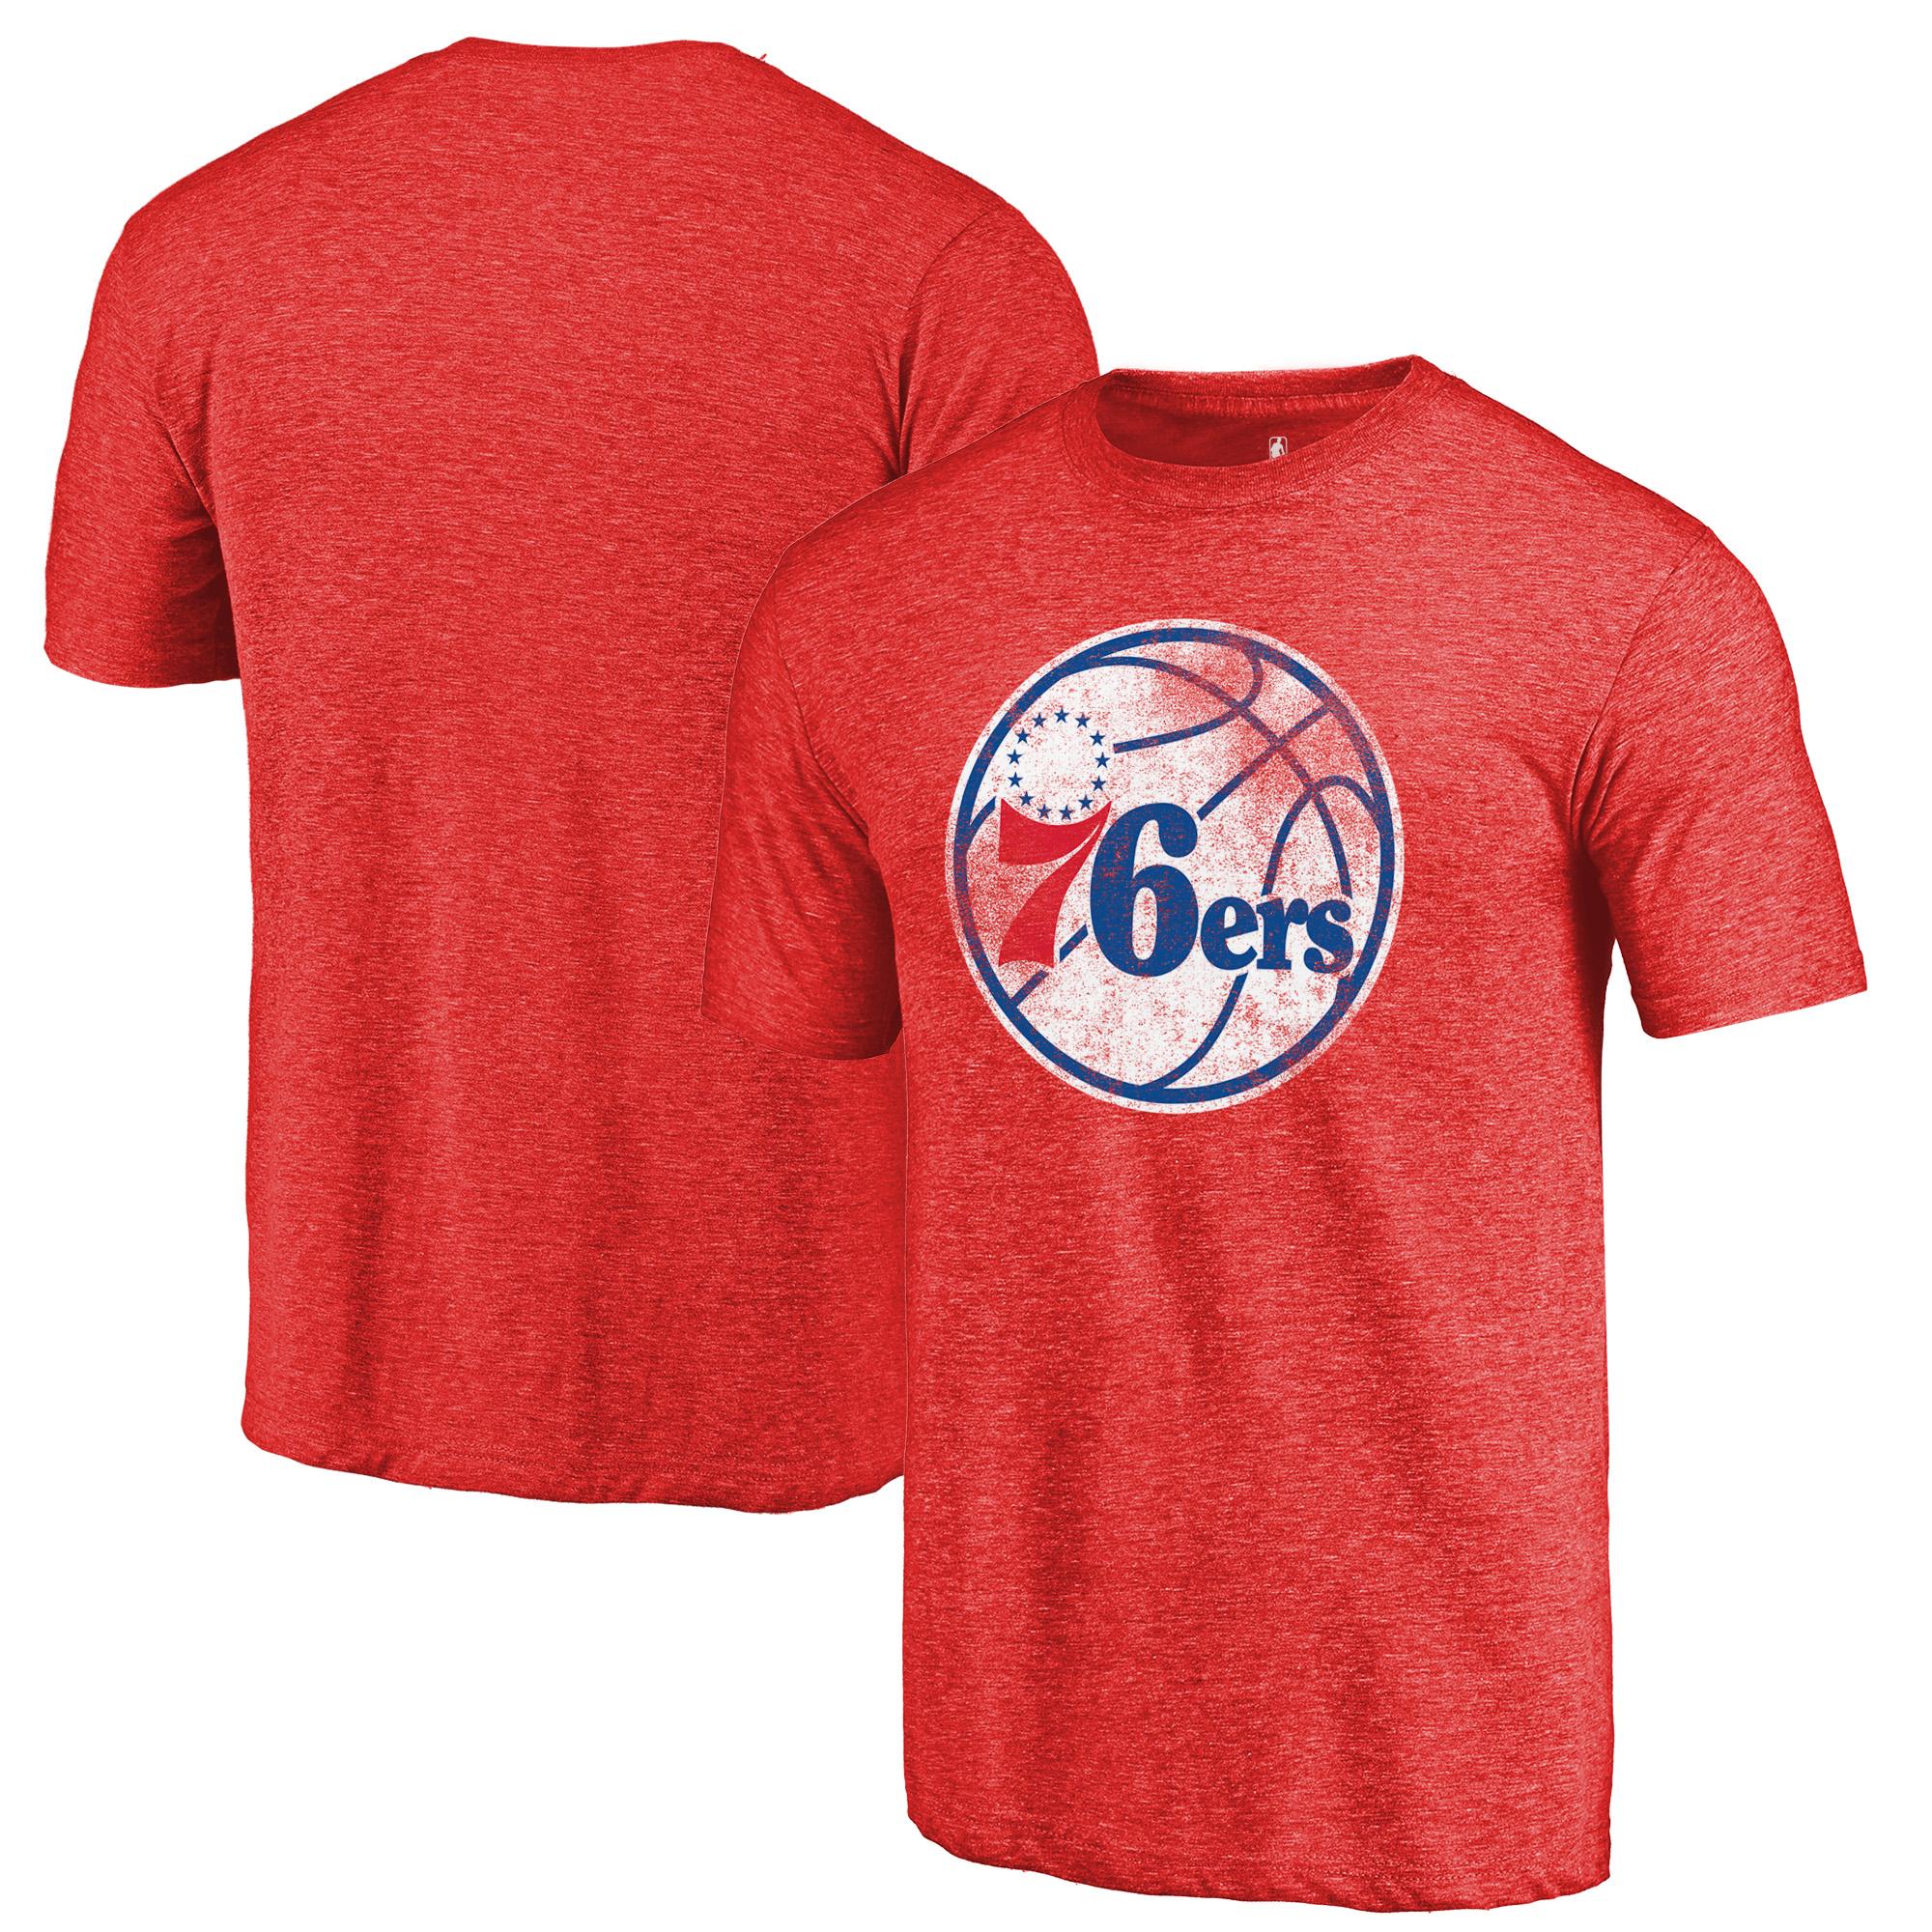 Philadelphia 76ers Fanatics Branded Distressed Logo Tri-Blend T-Shirt - Red